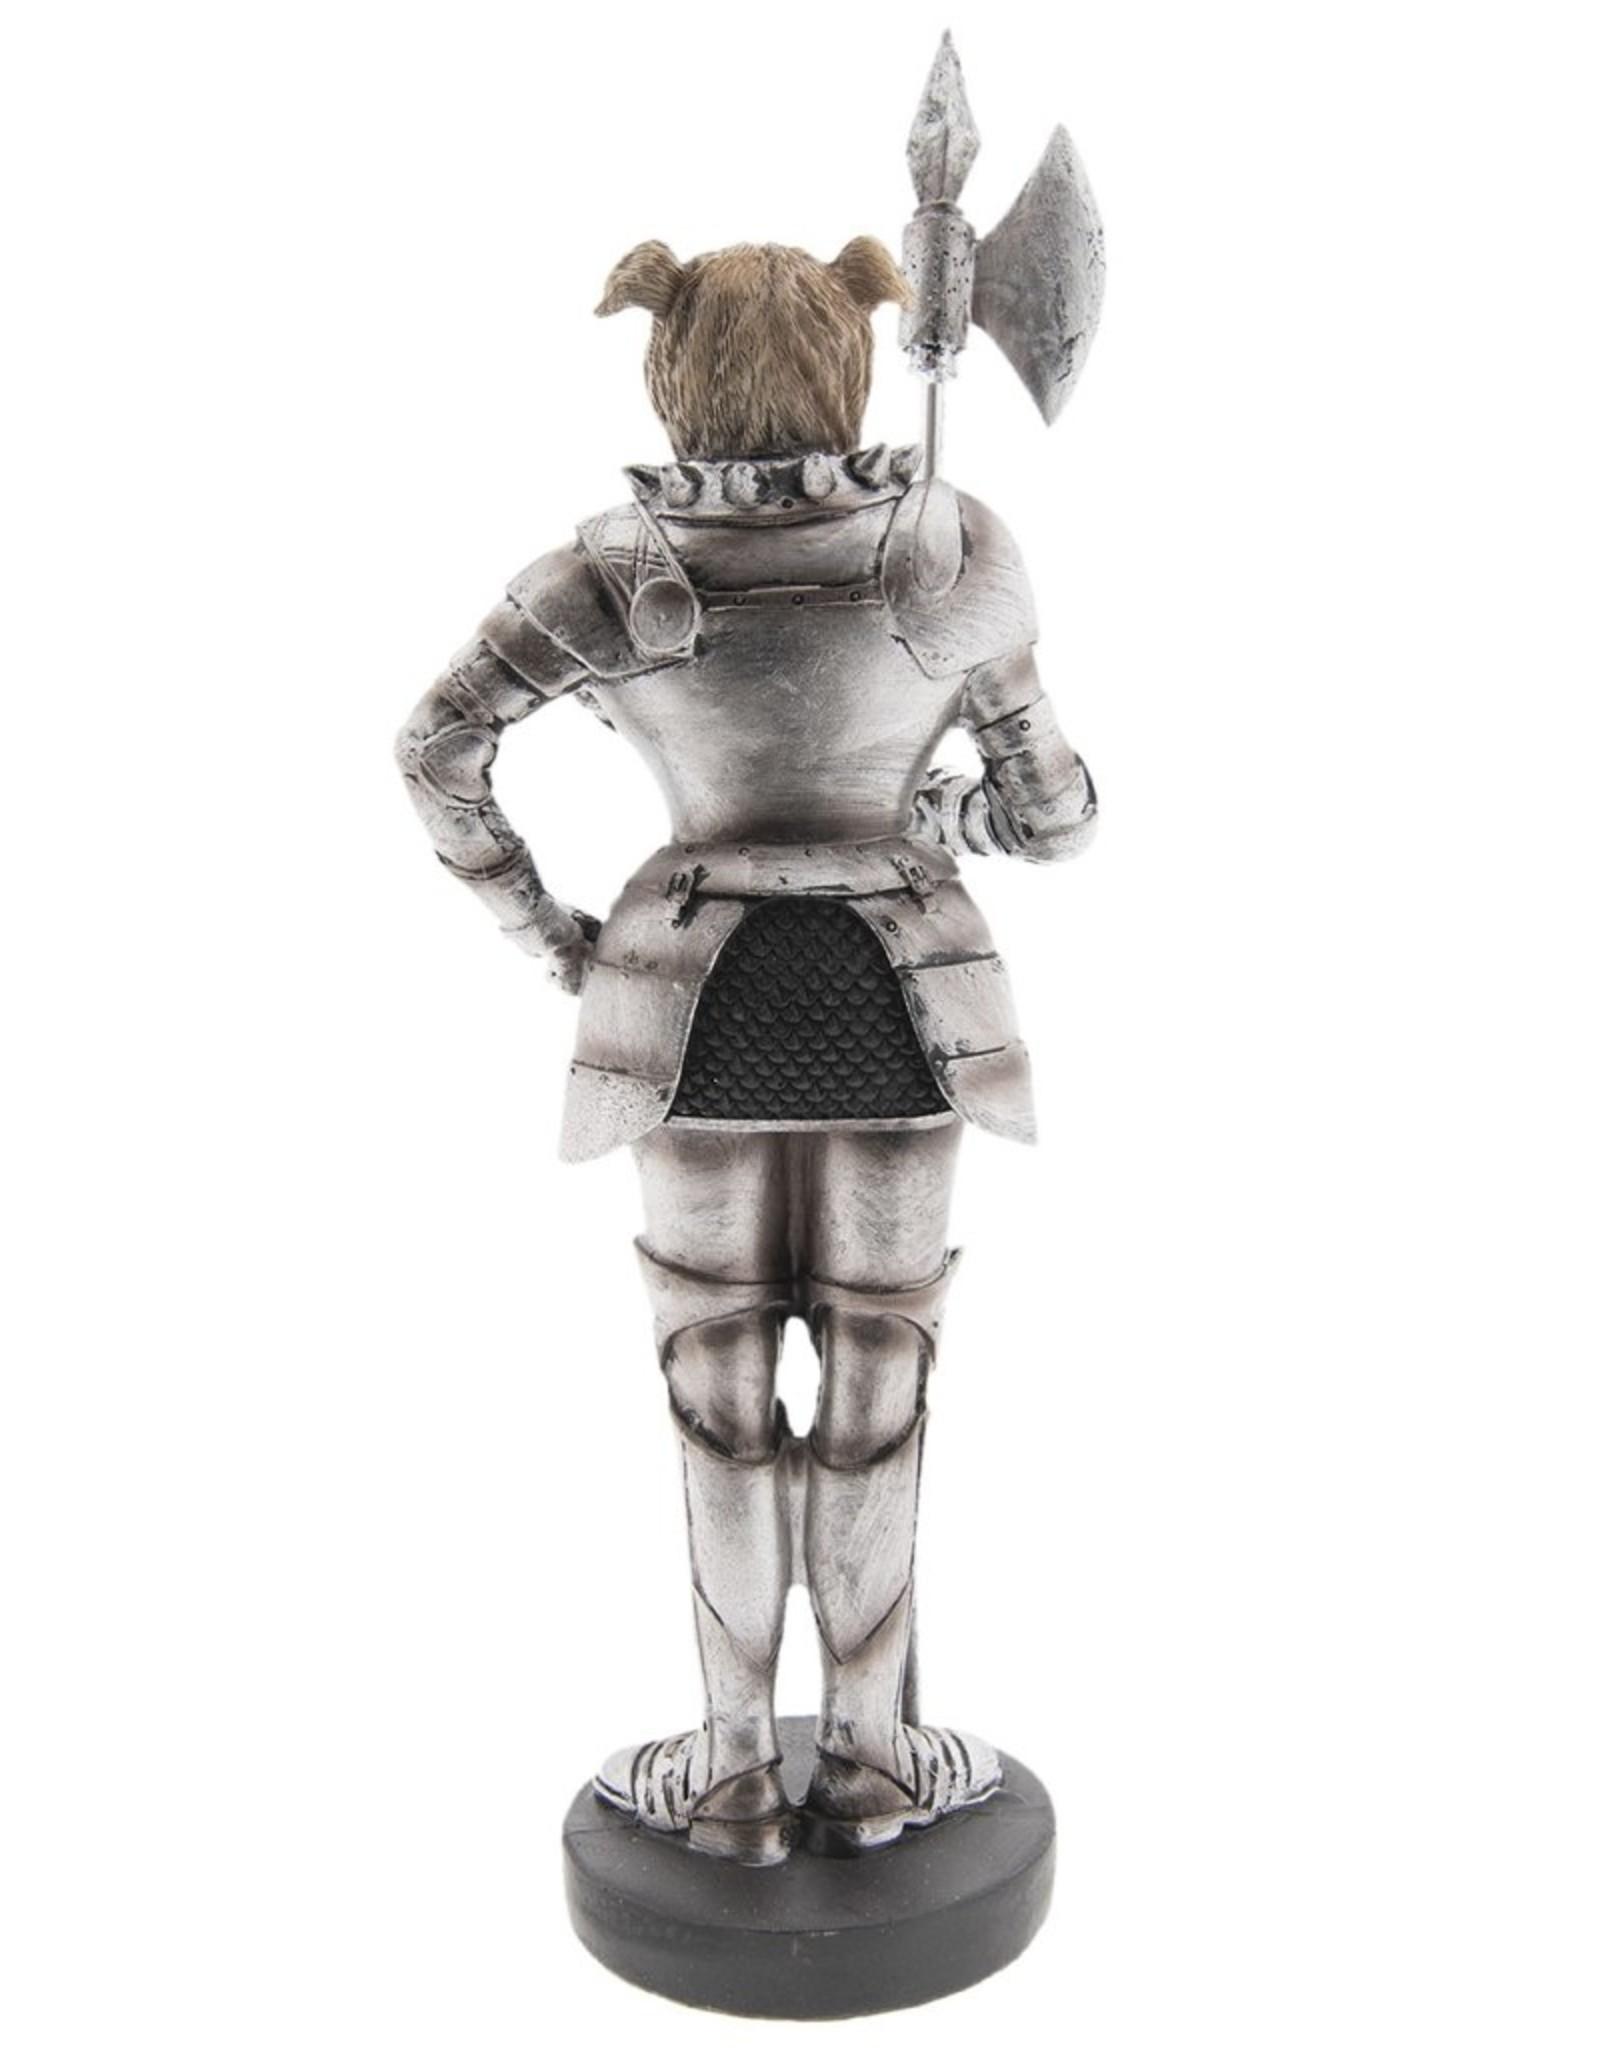 Bulldog Middeleeuwse Ridder beeld Giftware Beelden Collectables - Bulldog Middeleeuwse Ridder beeld 33cm